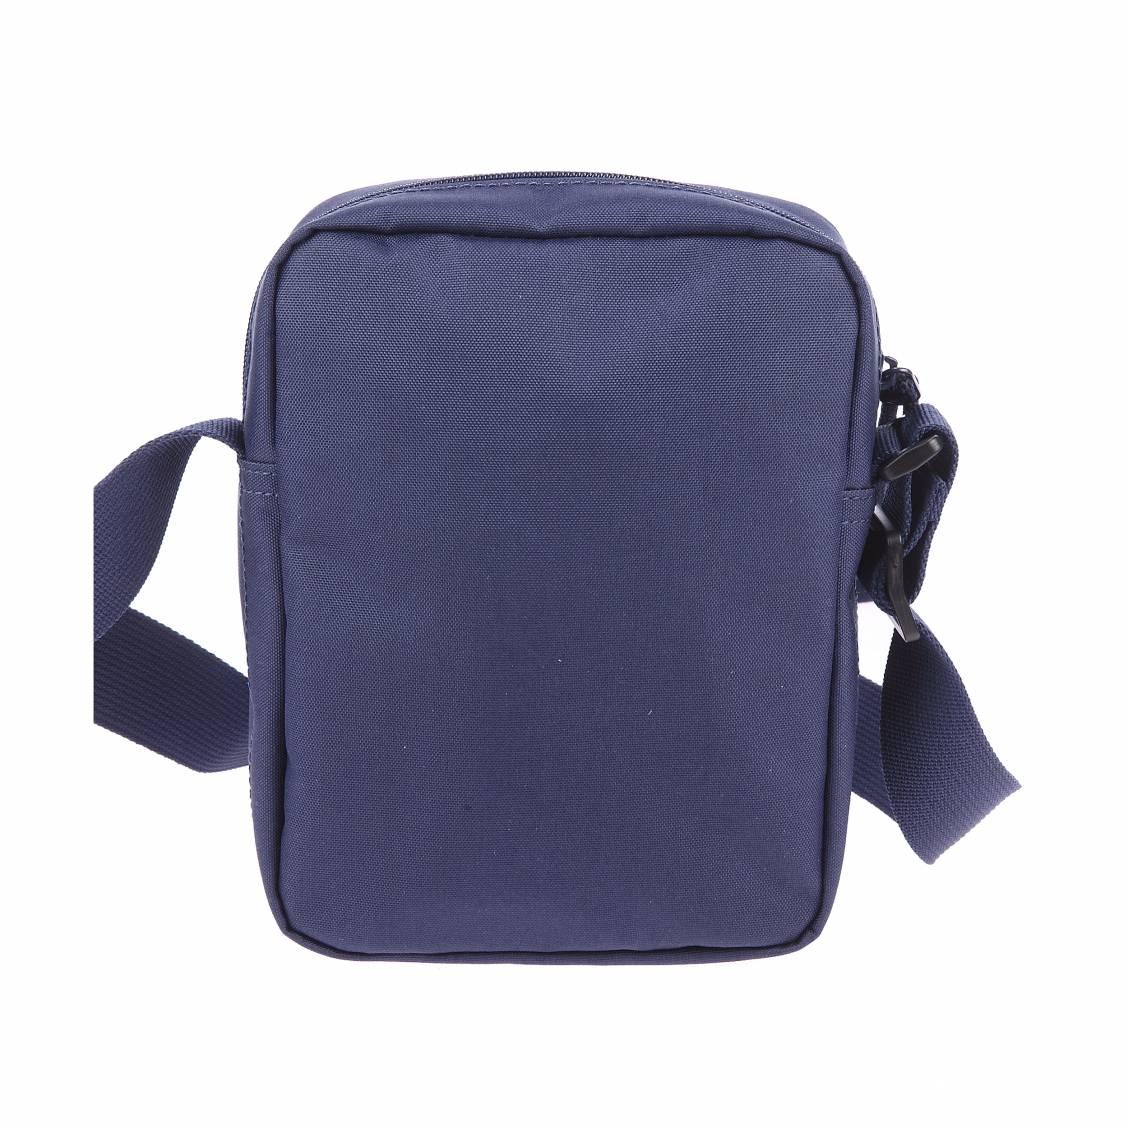 Petite sacoche Lacoste en toile bleu marine NJD282dE